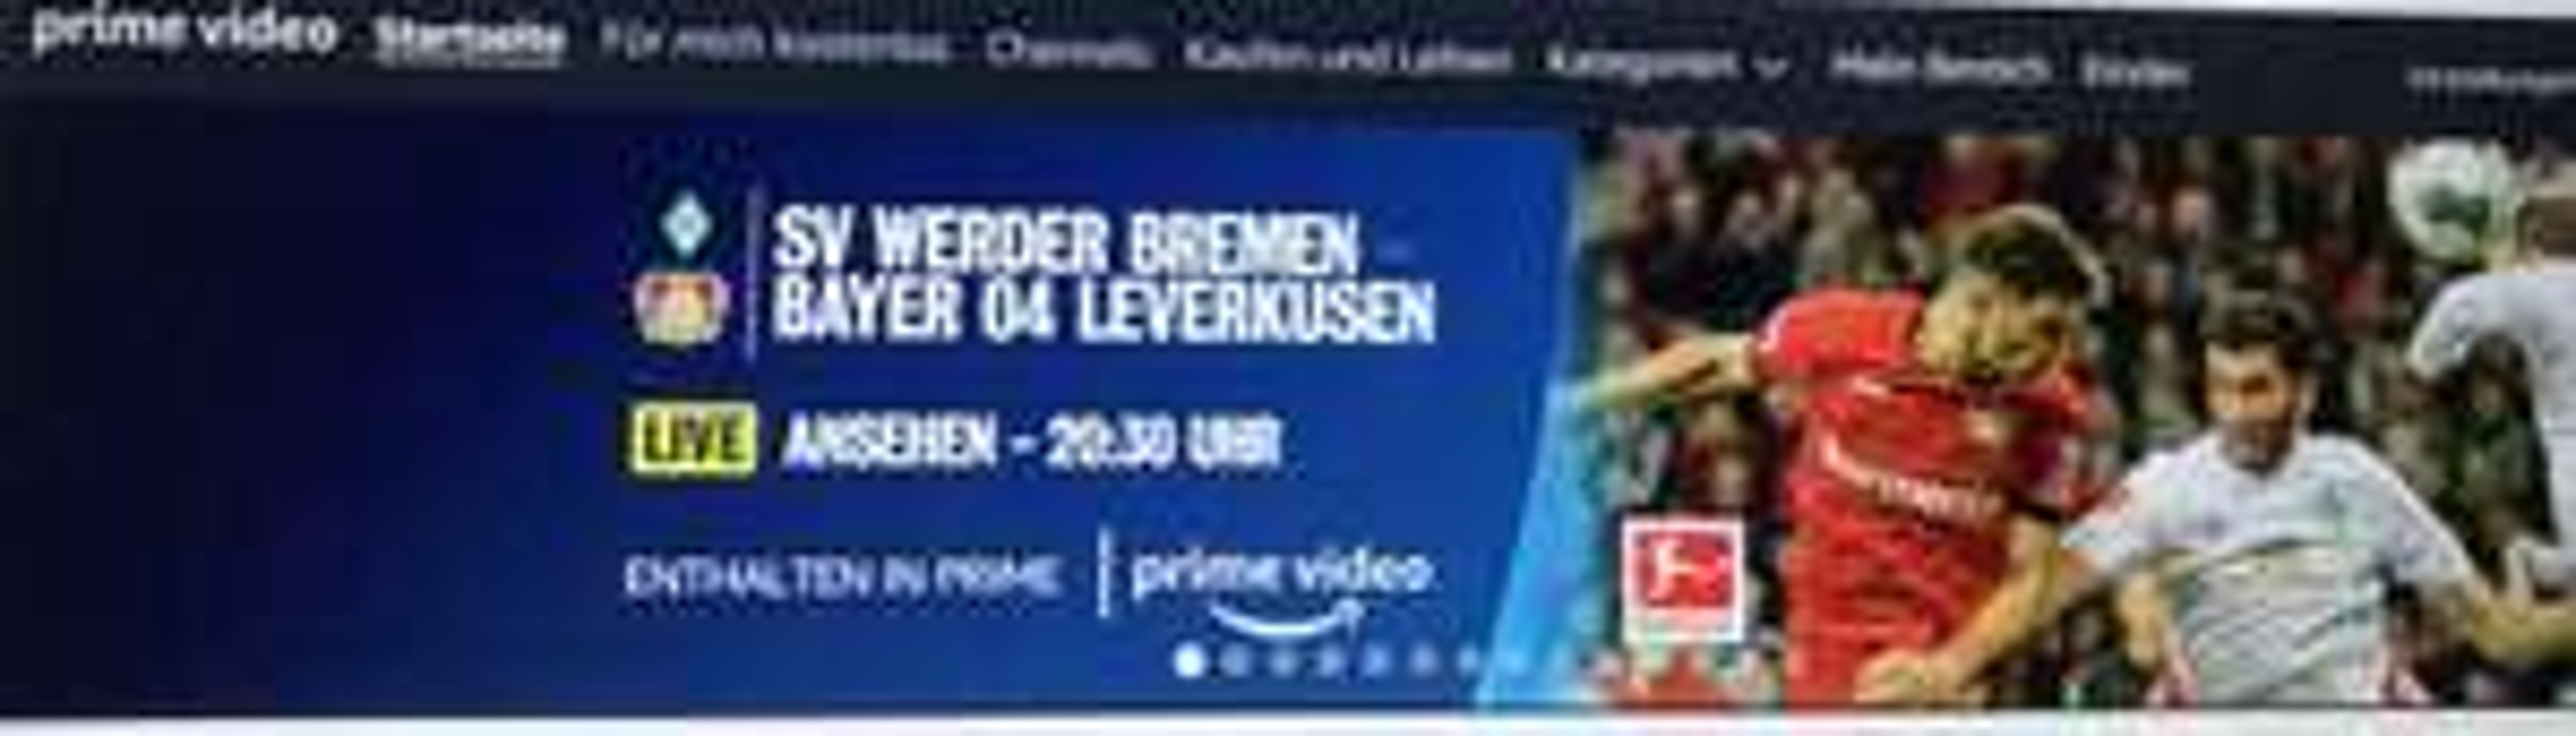 [Amazon Prime Member] Fußball Bremen vs. Leverkusen